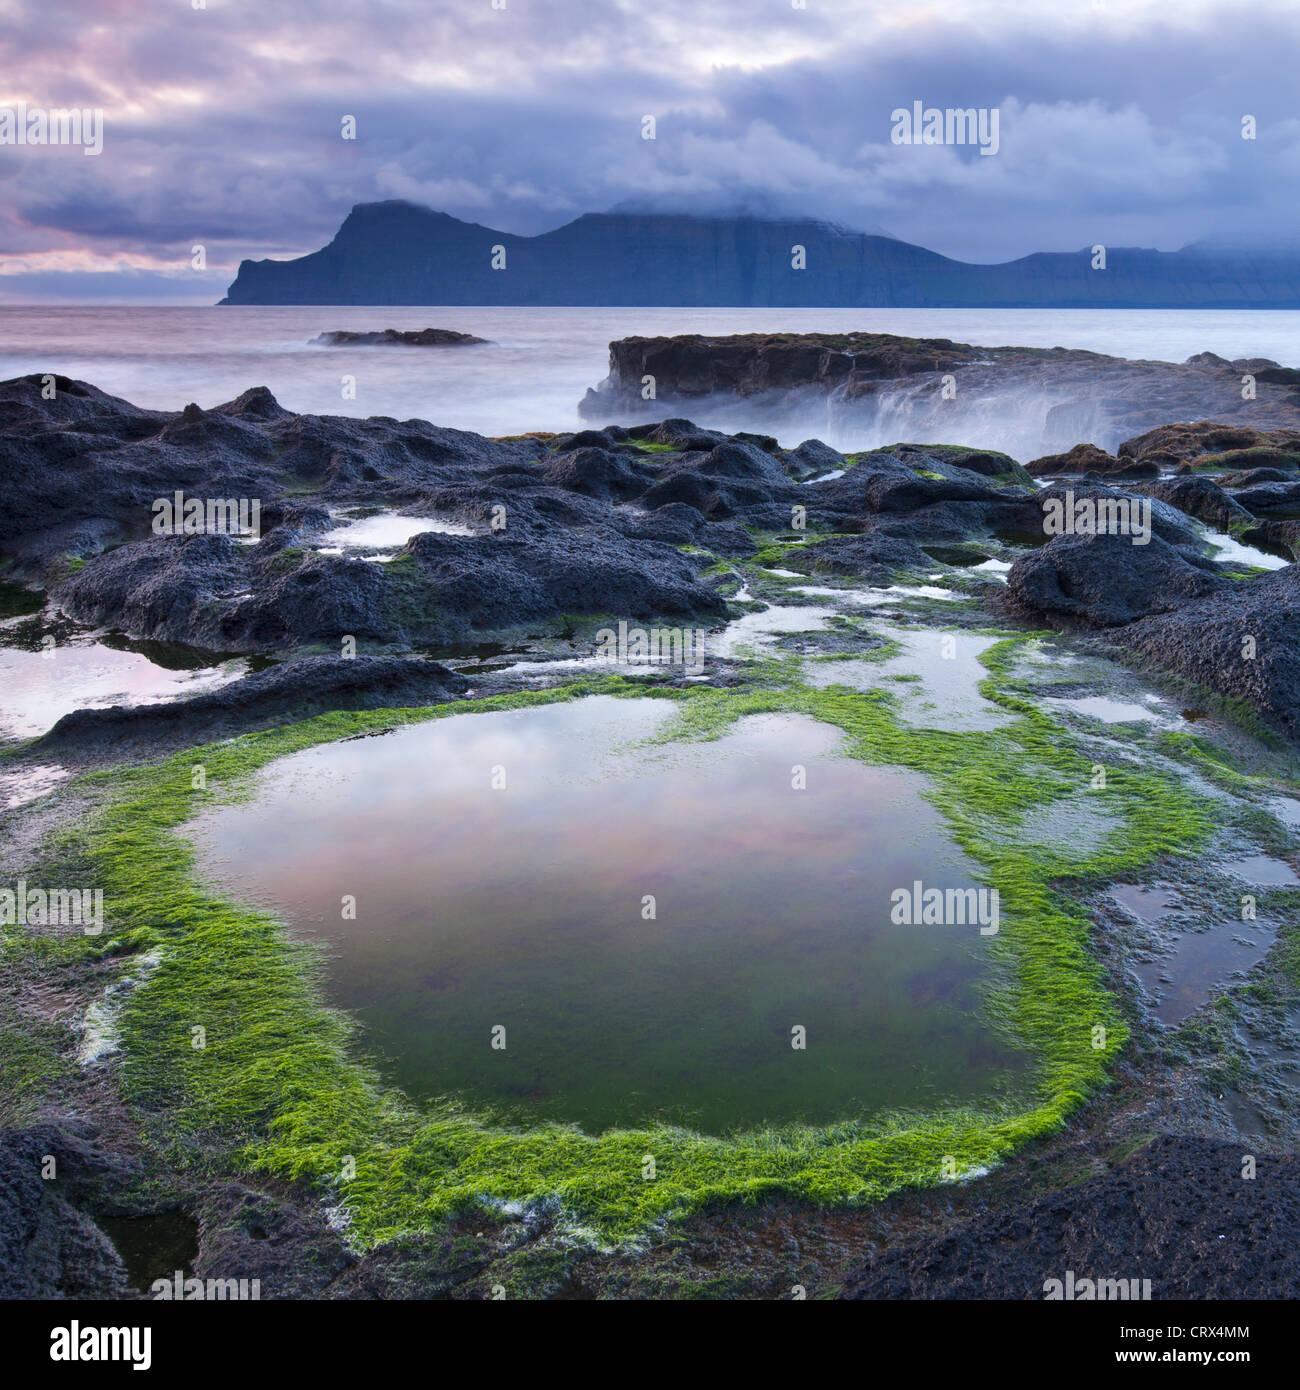 Rockpools on the shores of Gjogv on Eysturoy, looking towards the mountainous island of Kalsoy. Faroe Islands. - Stock Image